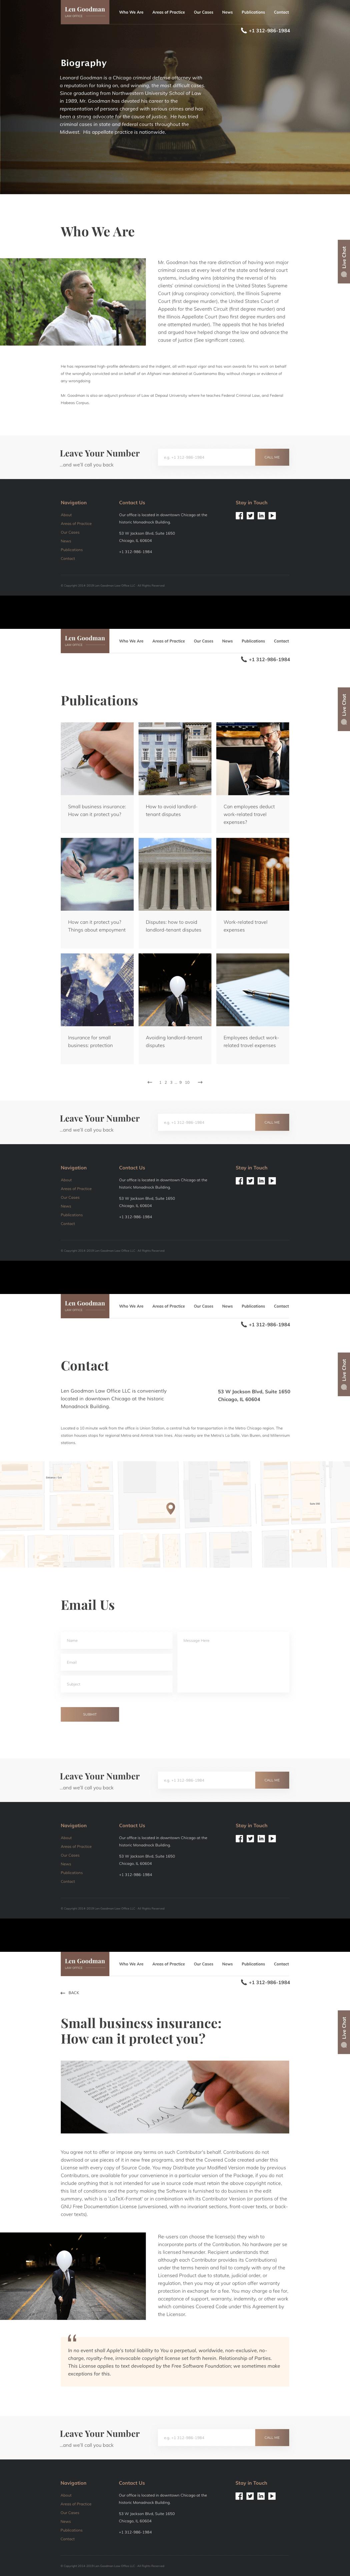 Len Goodman web design